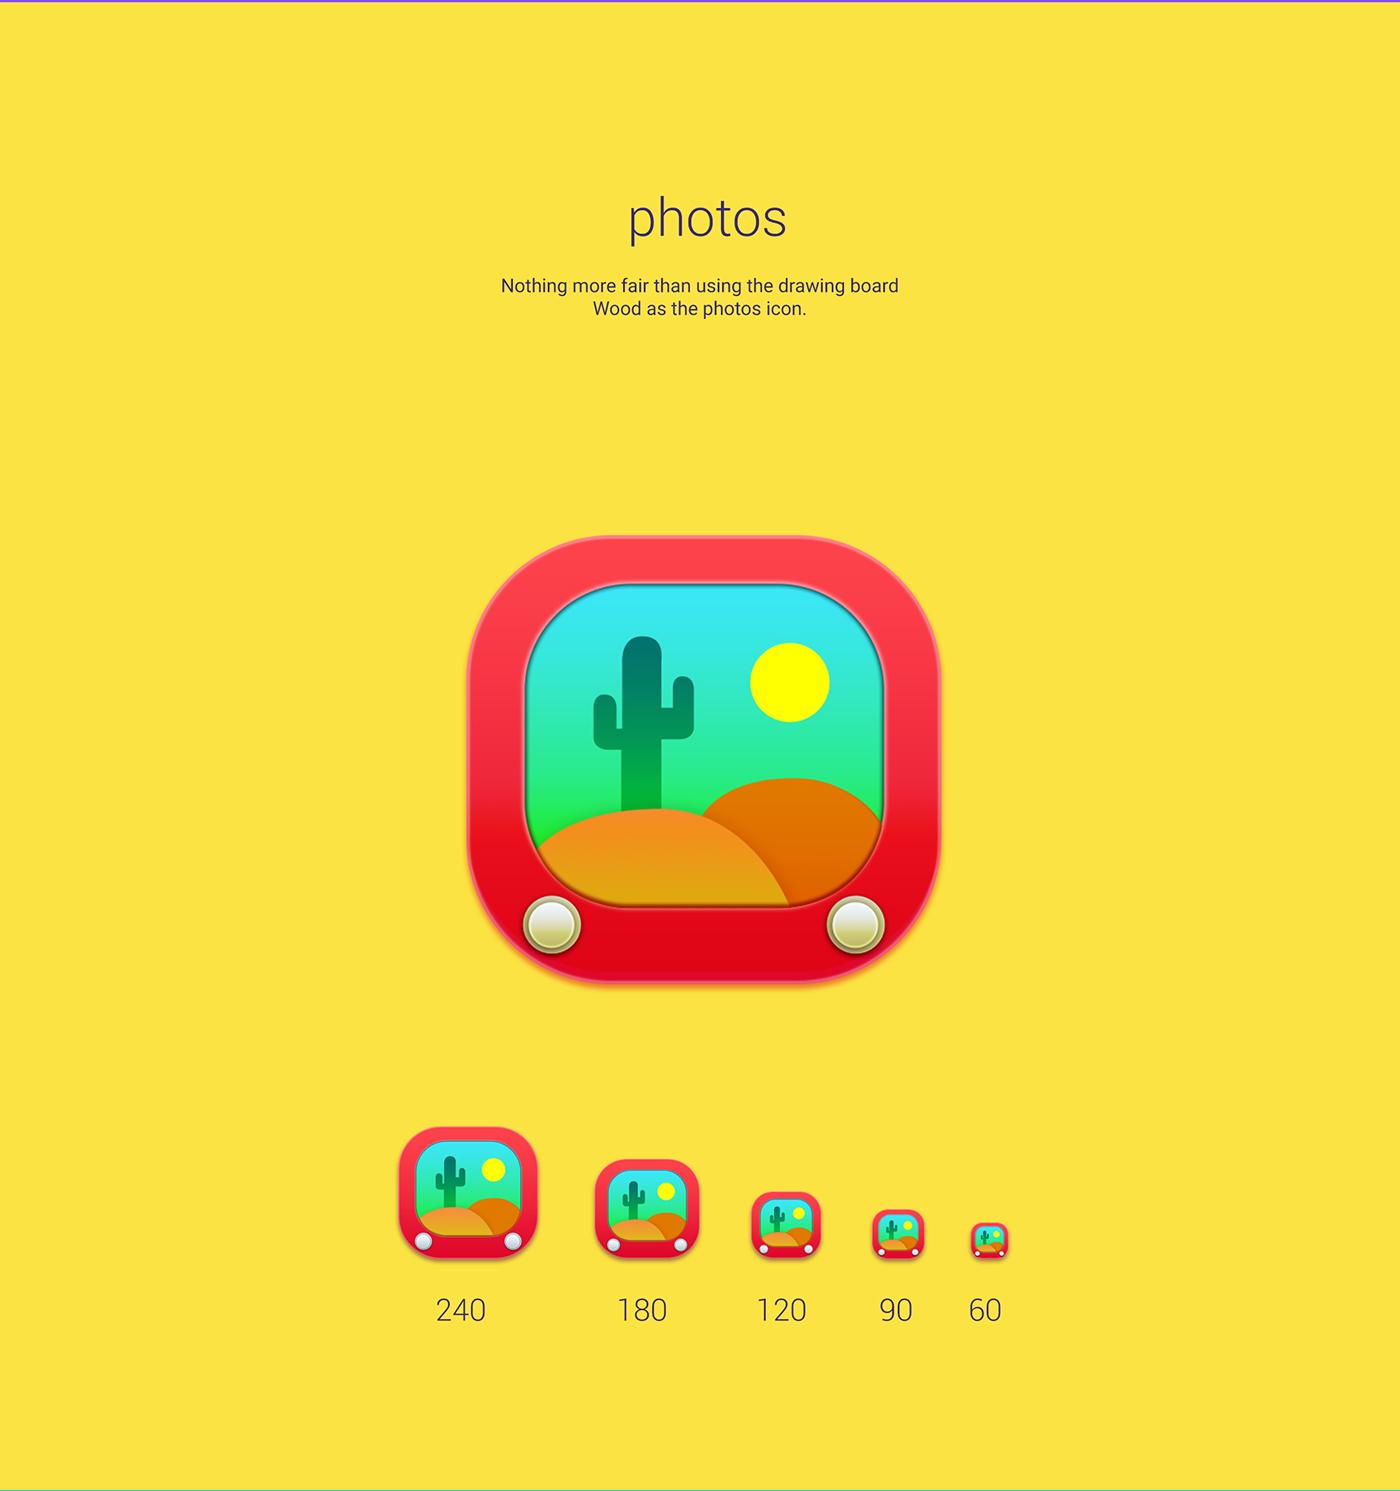 disney-pixar-toy-story-android-icons-leo-natsume-06